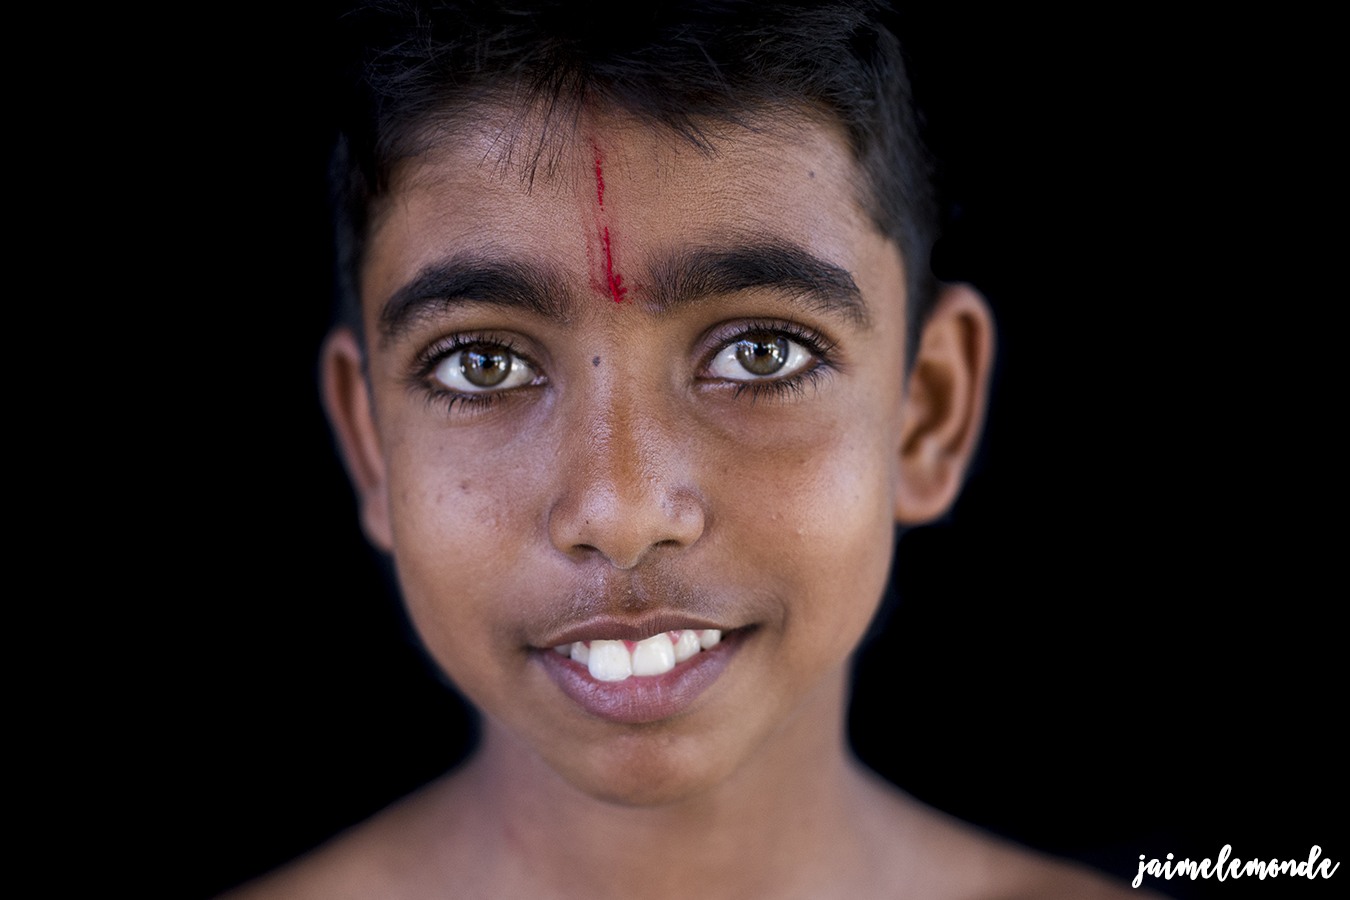 Portraits de voyage au Sri Lanka ©jaimelemonde (8)